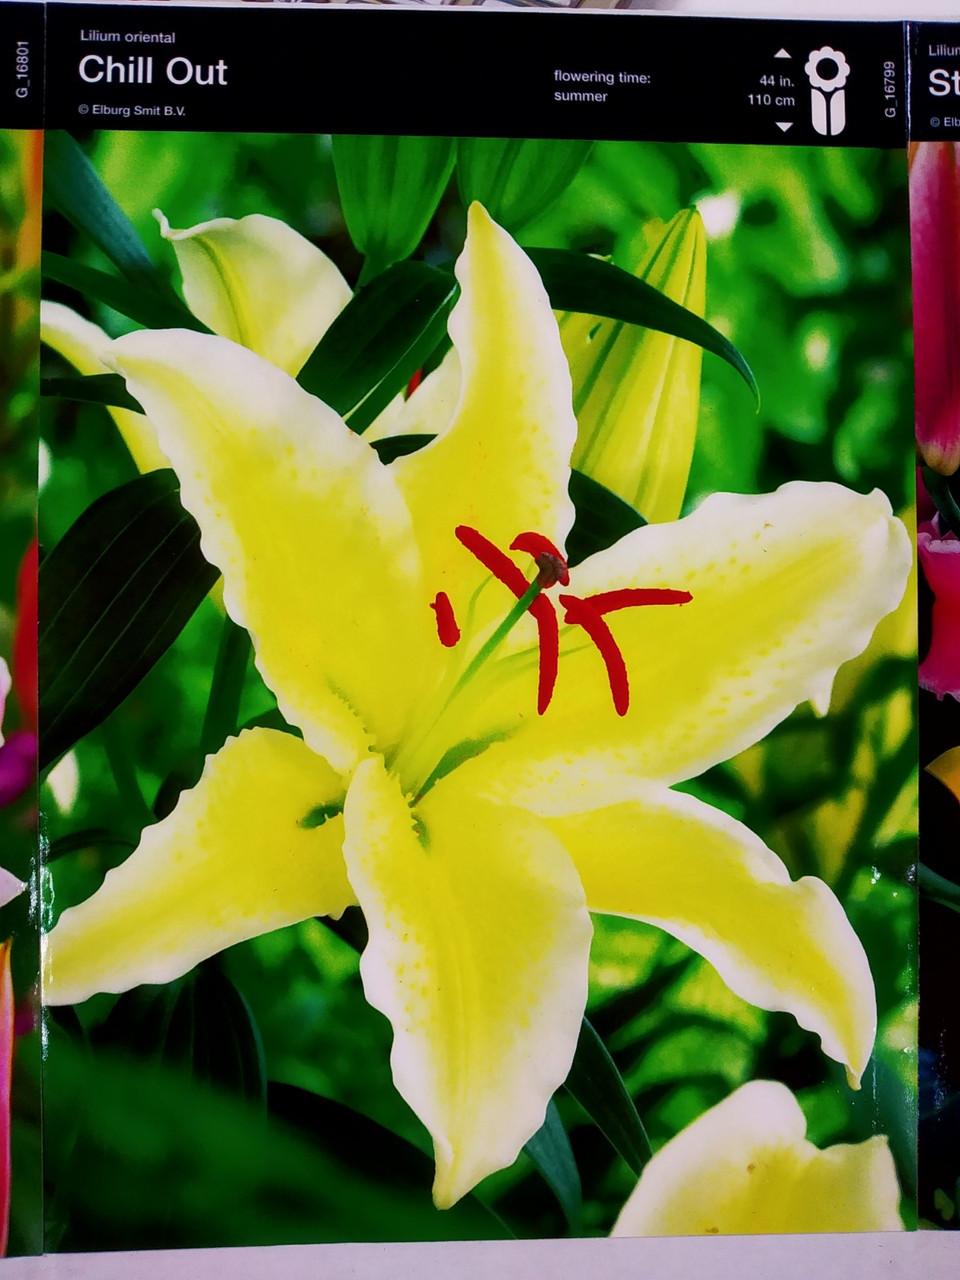 Лилия ориентальная ярко желтая  Chill Out , 1 шт луковица, Junior, Голландия